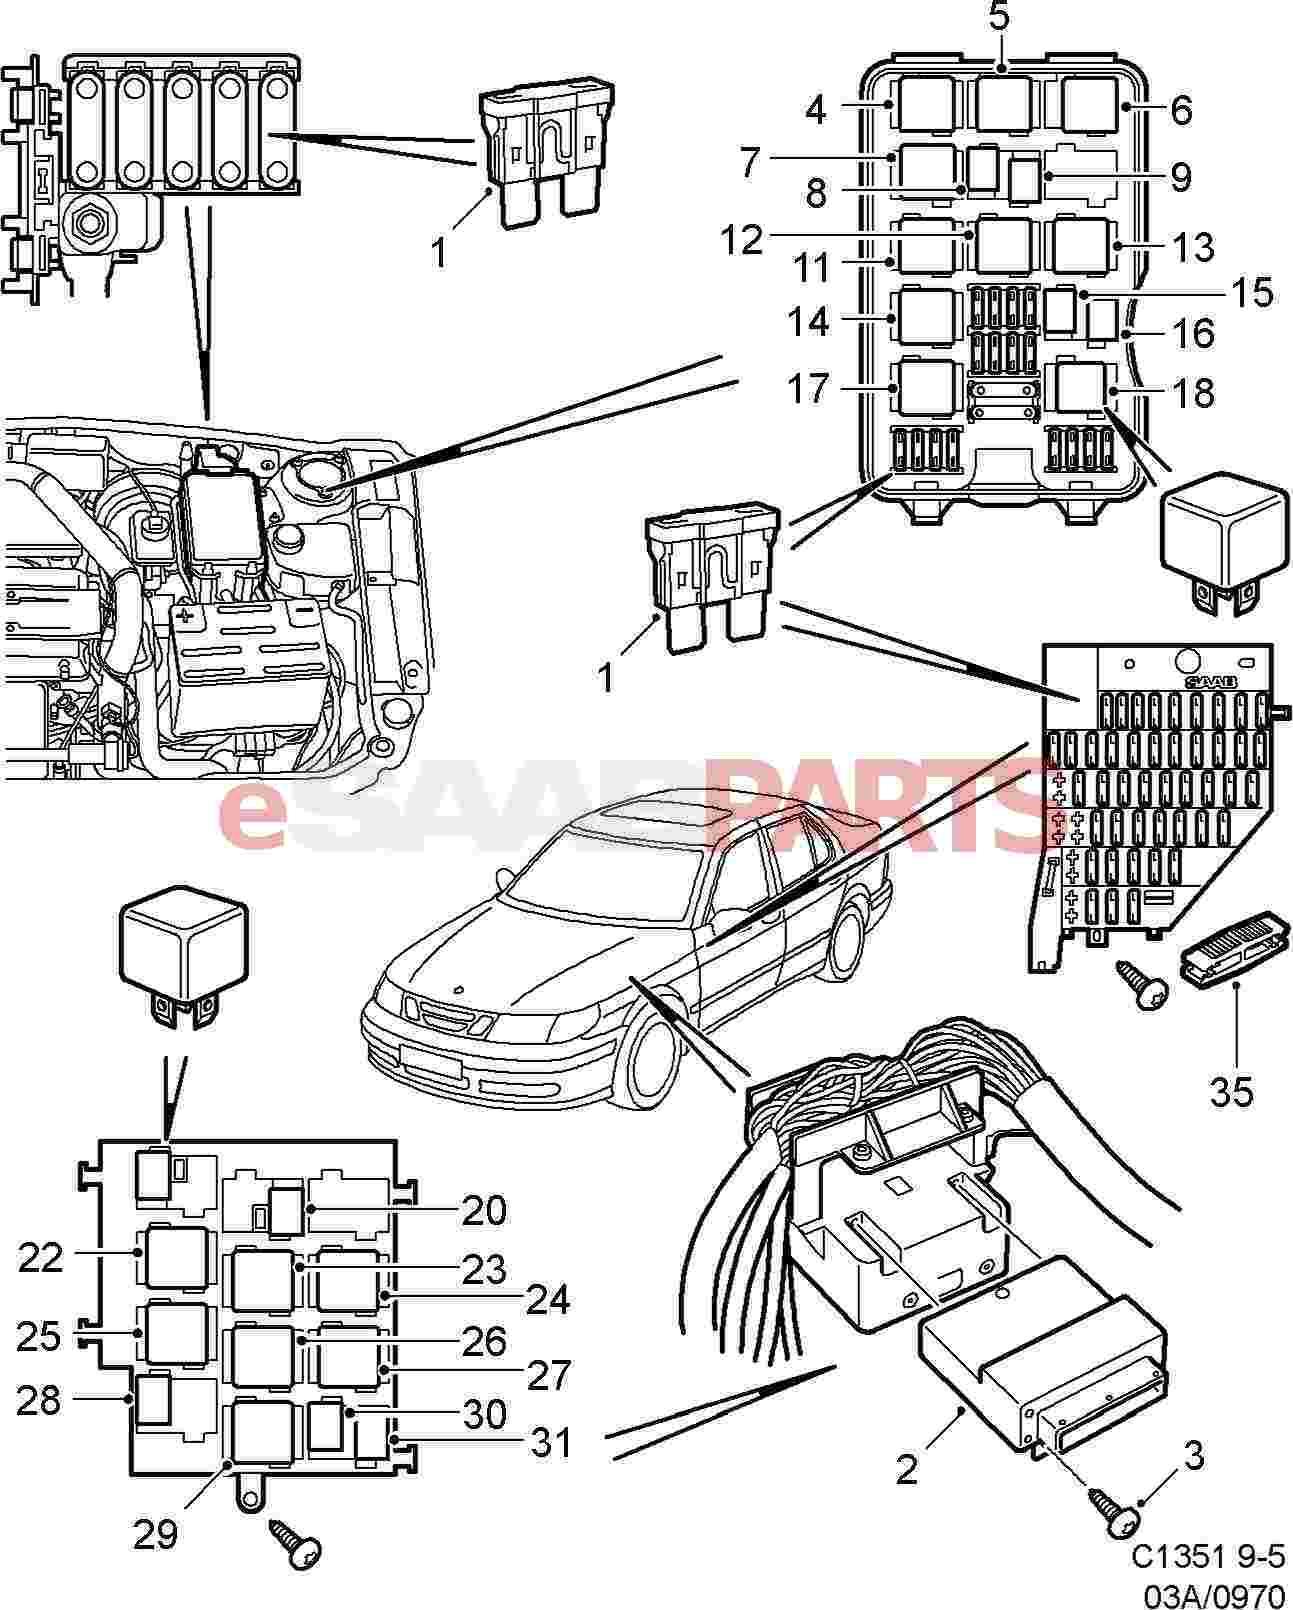 hight resolution of 93 heated seats 2003 saab 9 3 fuse box diagram saab wiring diagram images wiring diagram and fuse